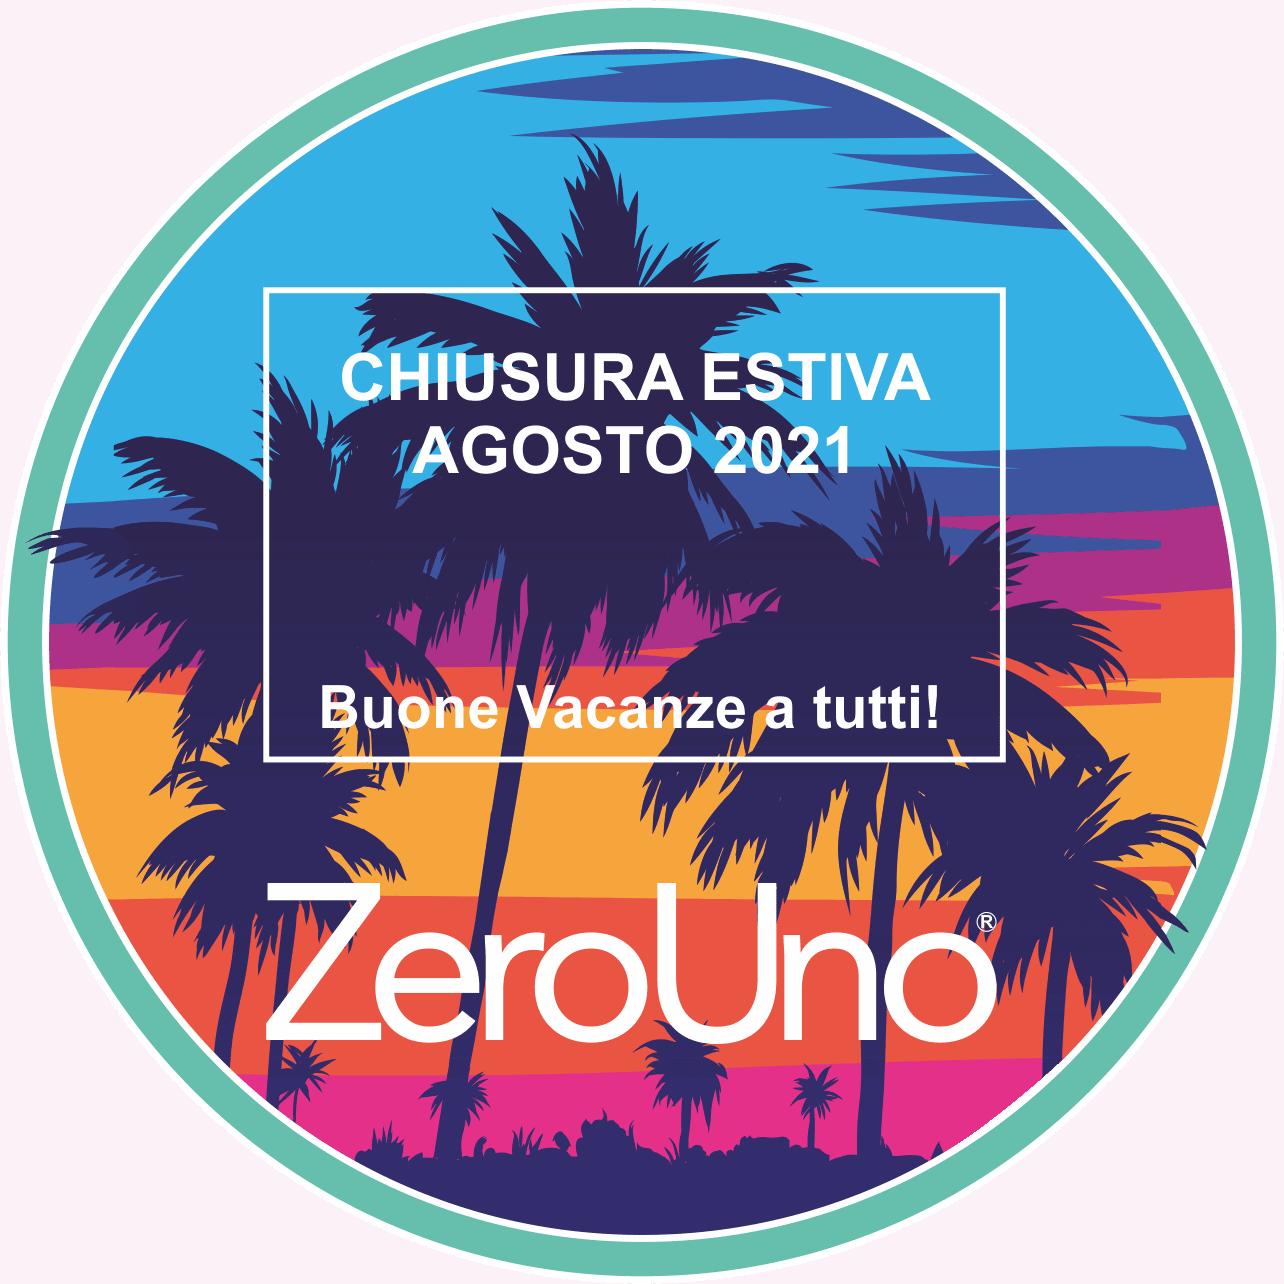 Chiusura Estiva Agosto 2021   ZeroUno   Piemonte   Beinasco   Torino   TO  IMMAGINE COPERTINA